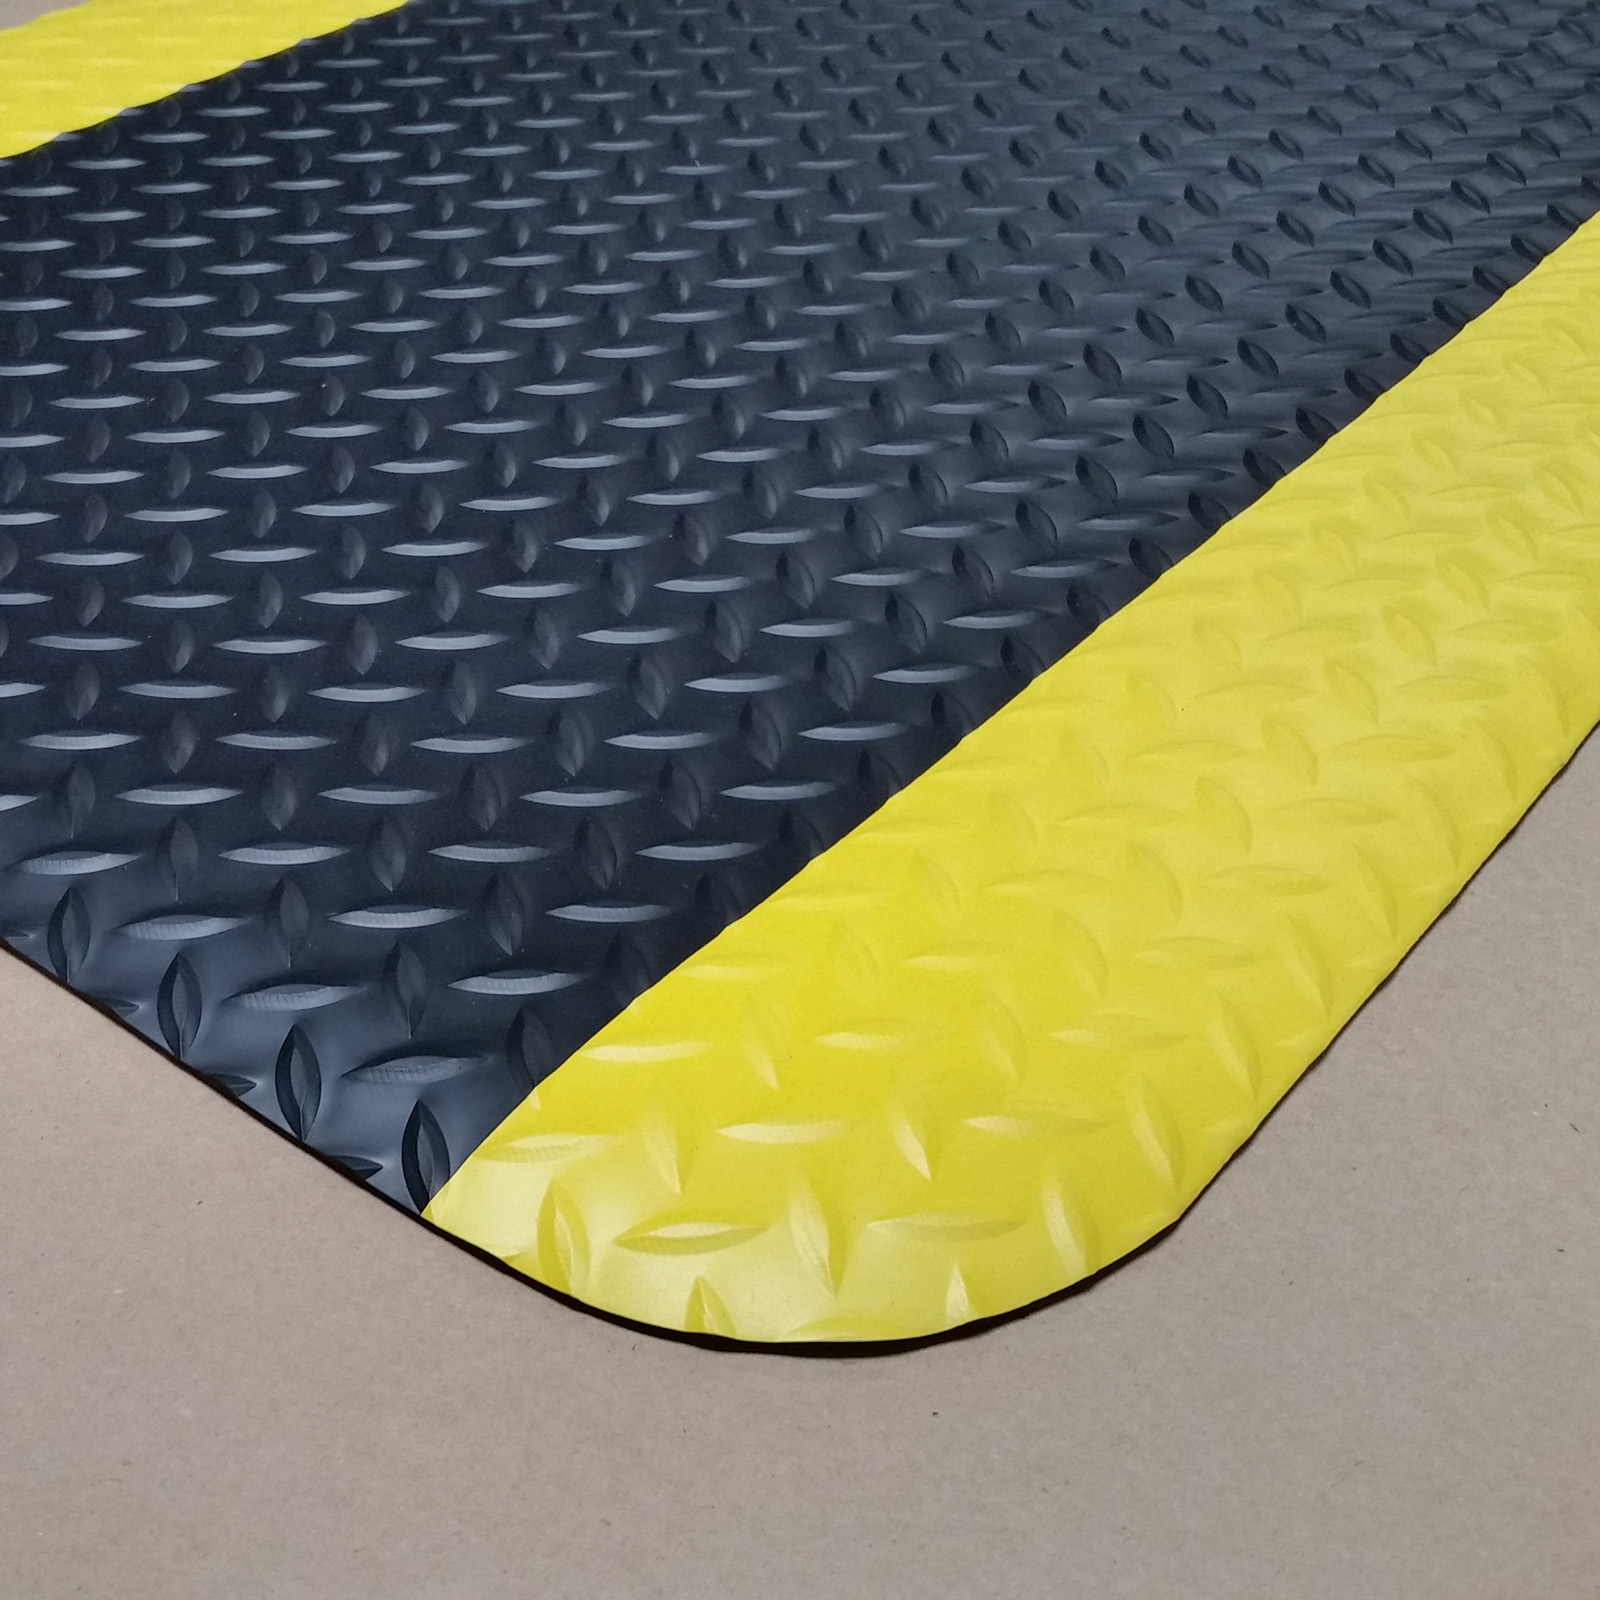 Cactus Mat 1053-23 floor mat, anti-fatigue